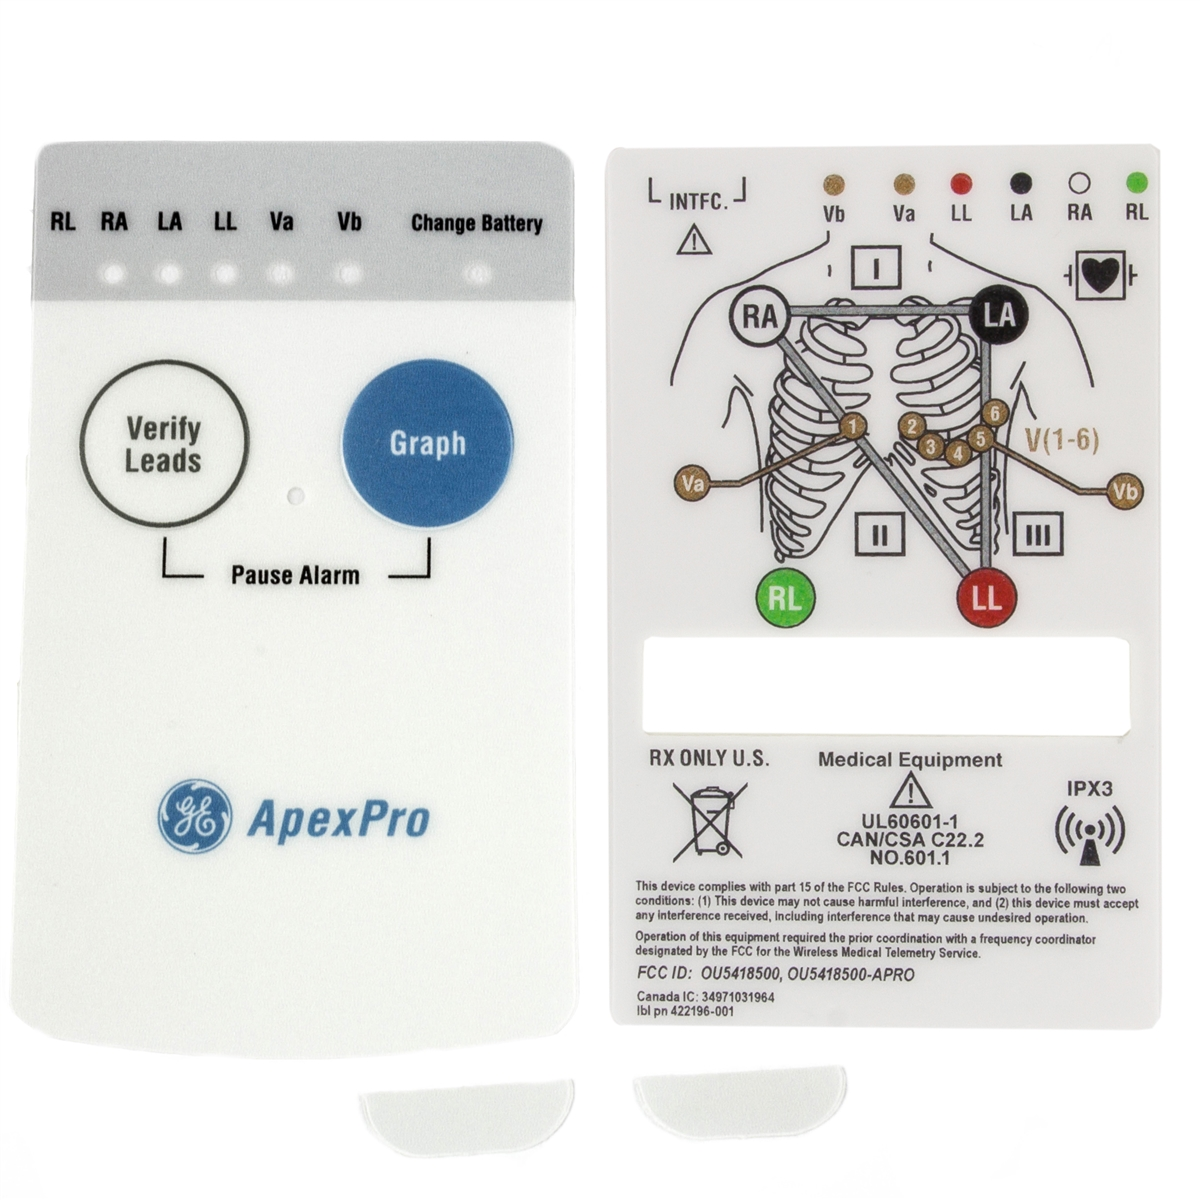 GE ApexPro Telemetry Transmitter Front & Rear Overlays & ECG Block Screw Covers